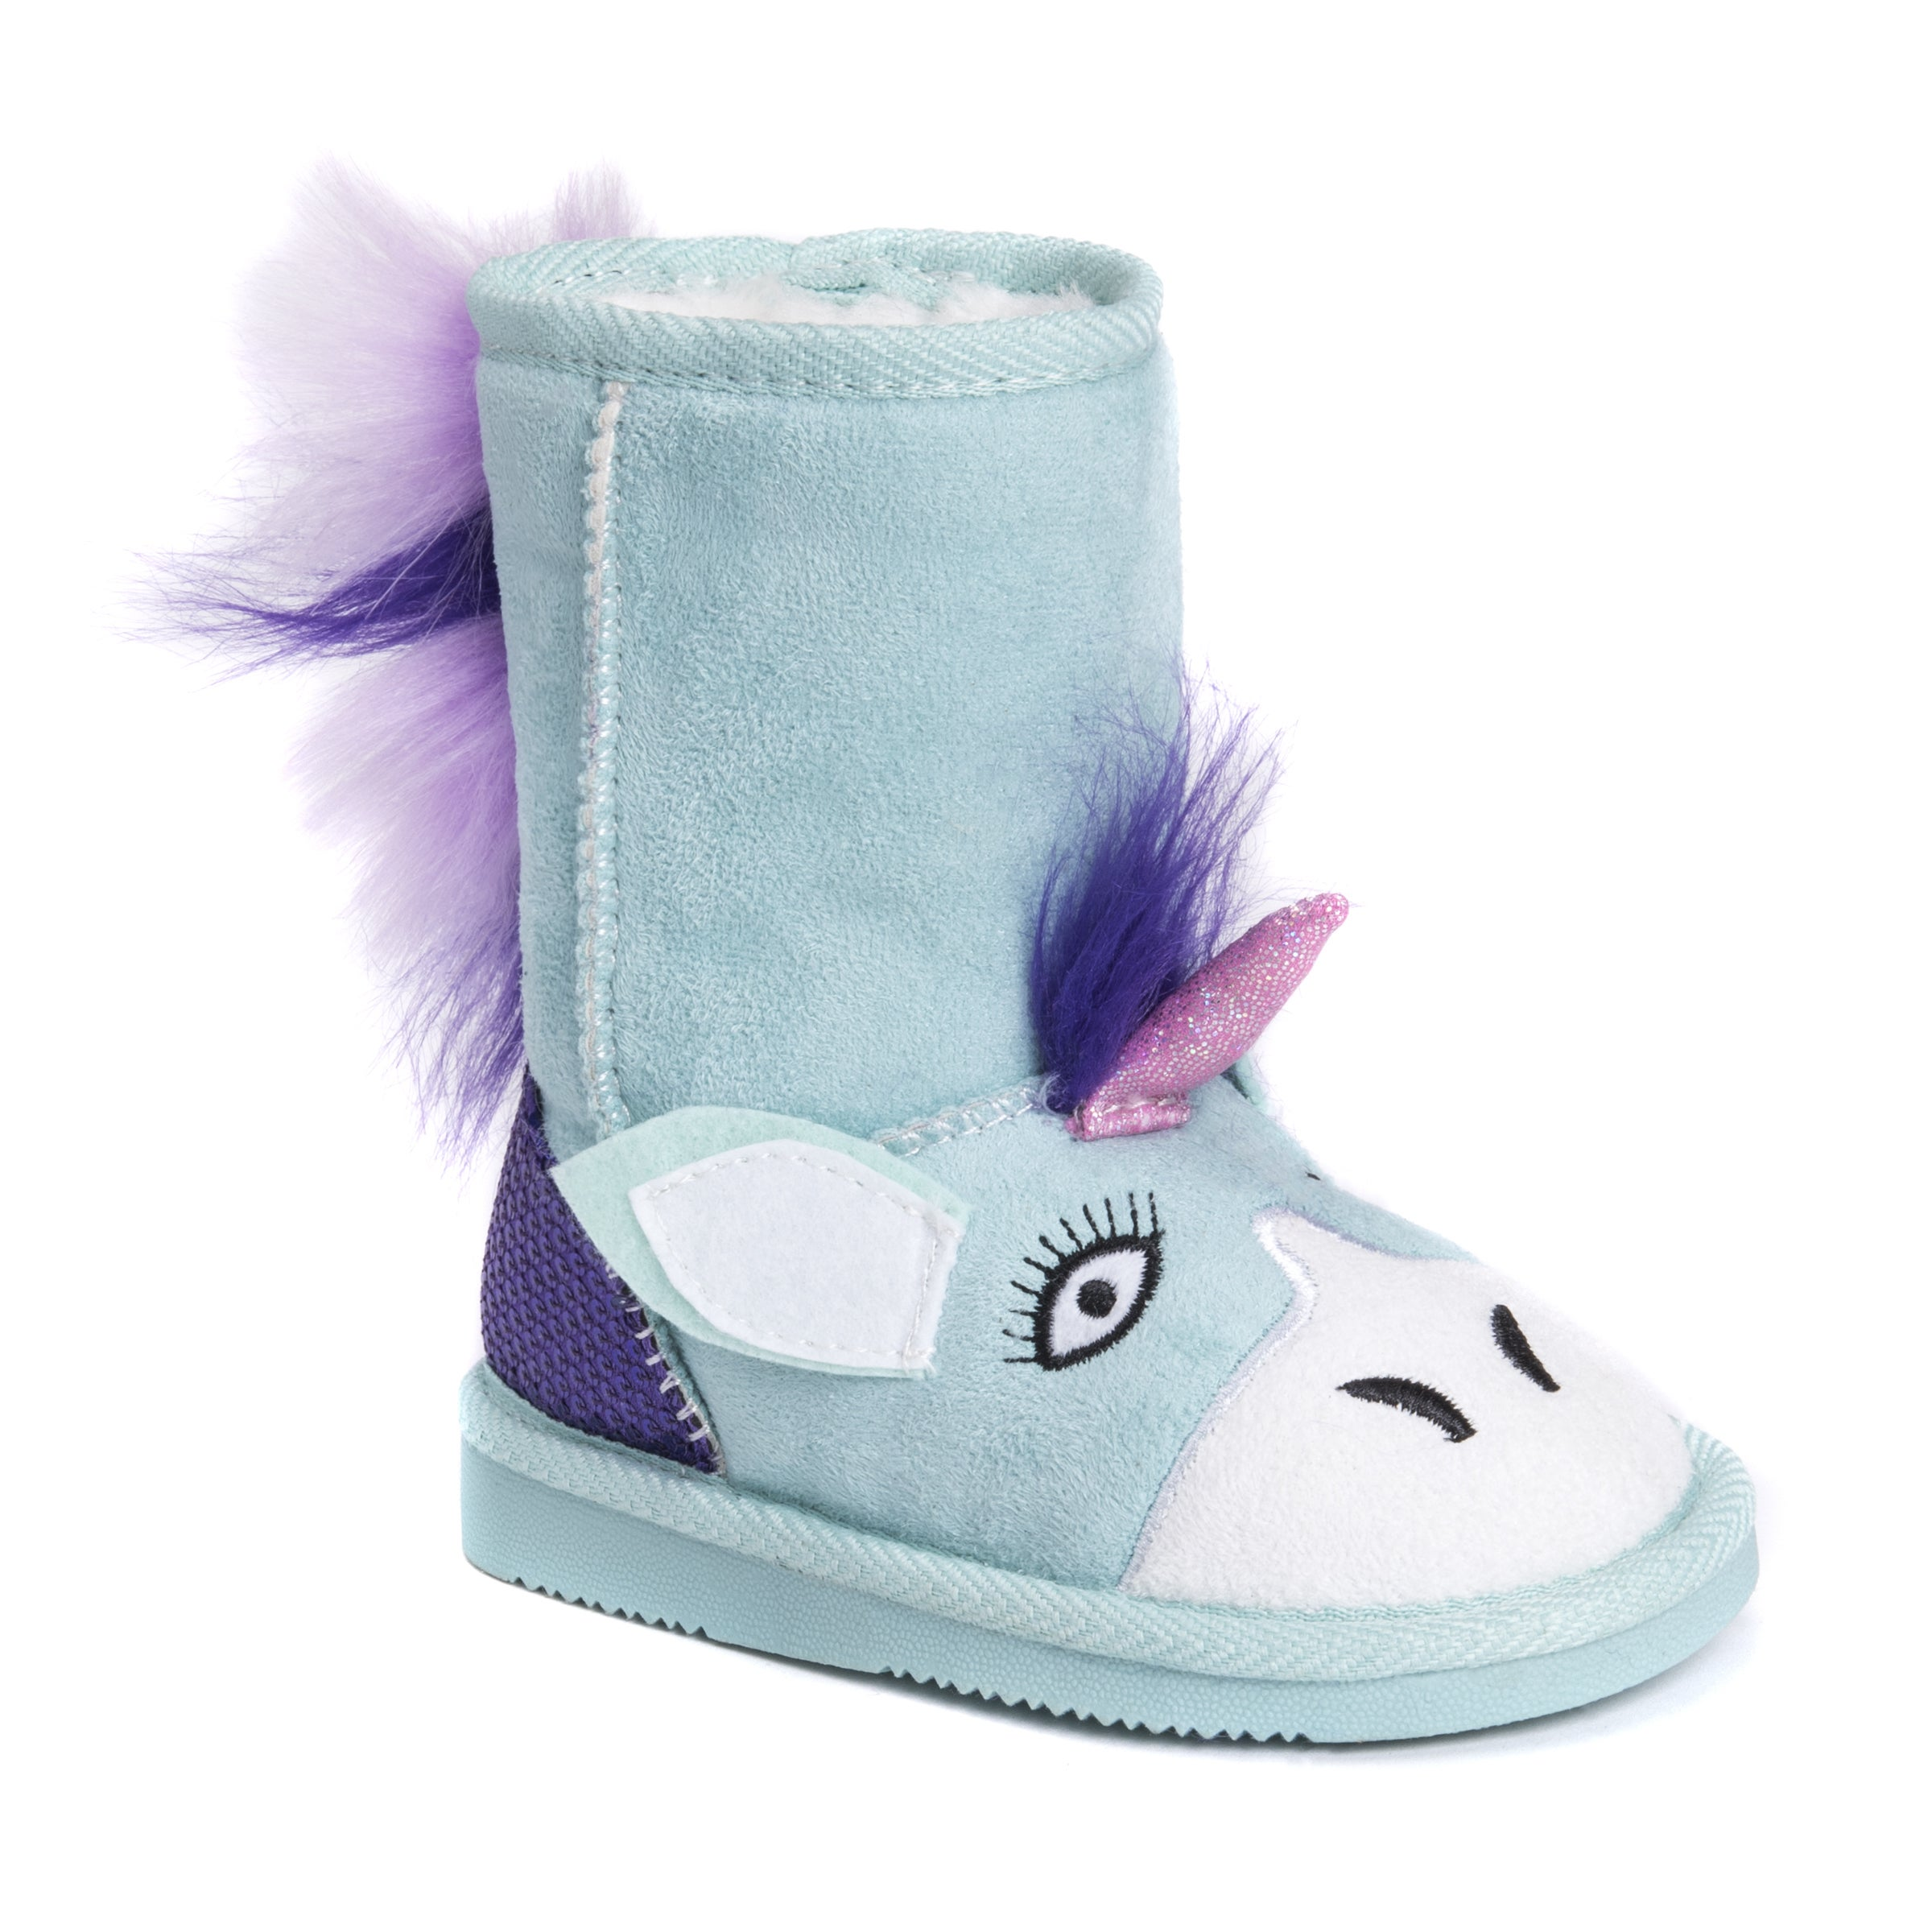 MUK LUKS Kid s Rainy Unicorn Boots Free Shipping Orders Over